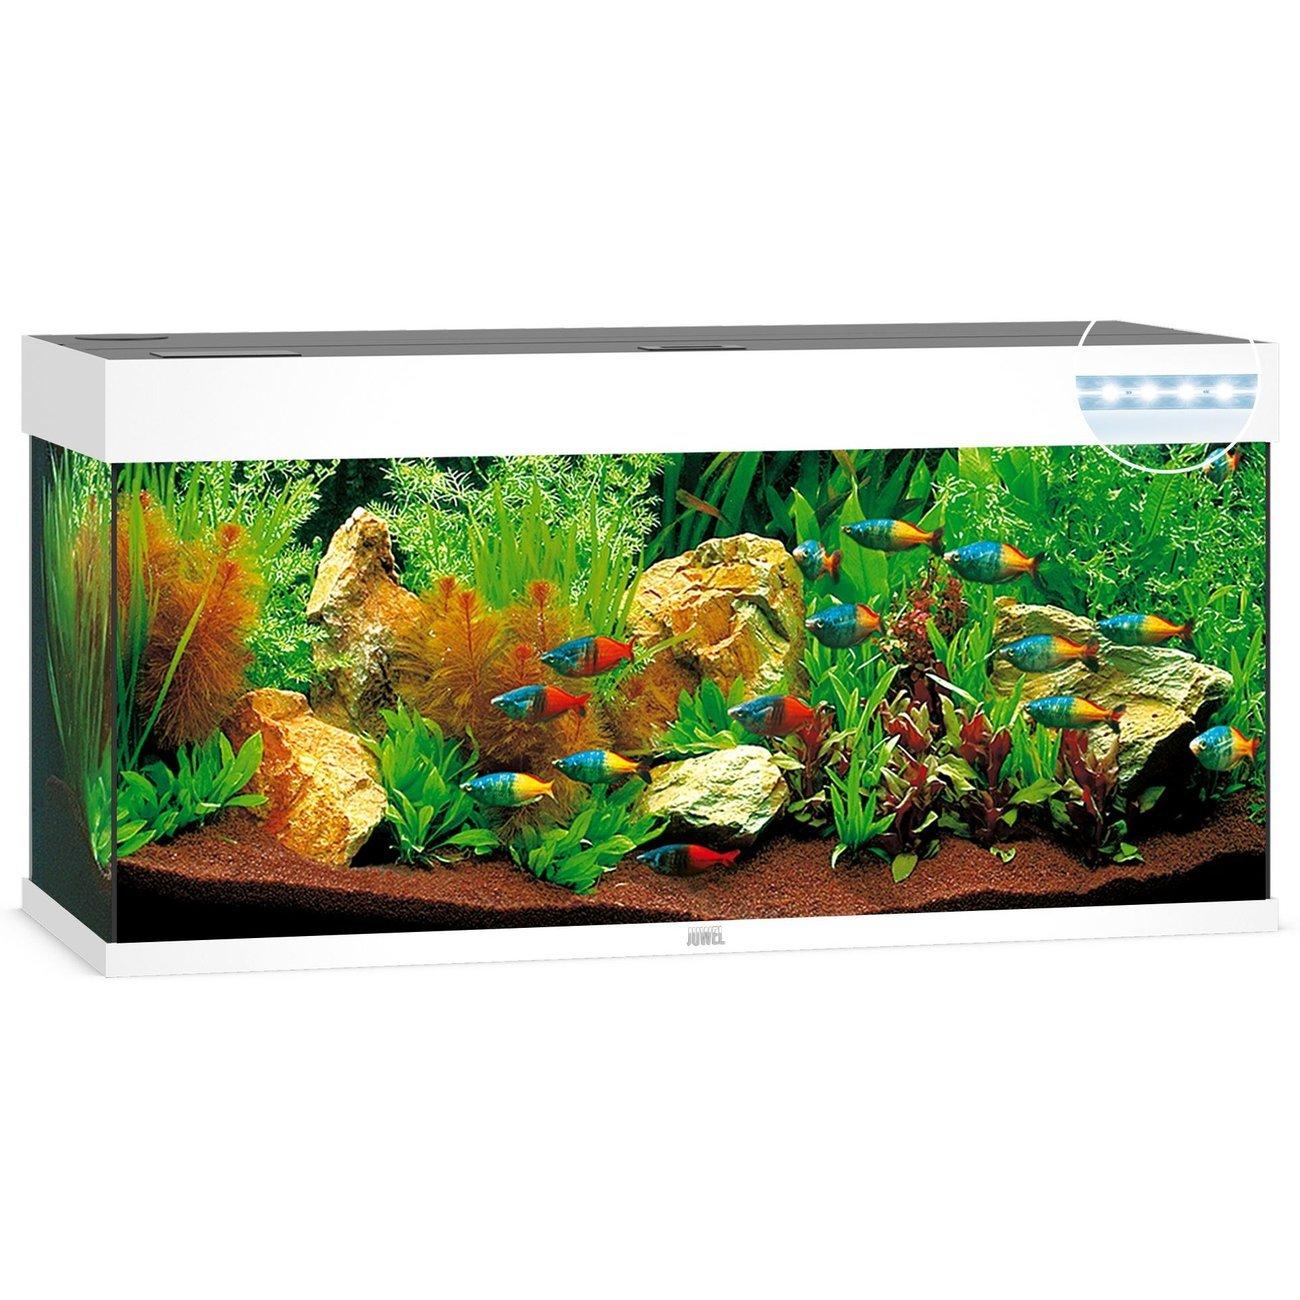 JUWEL Rio 180 LED Aquarium, 180 Liter, weiß